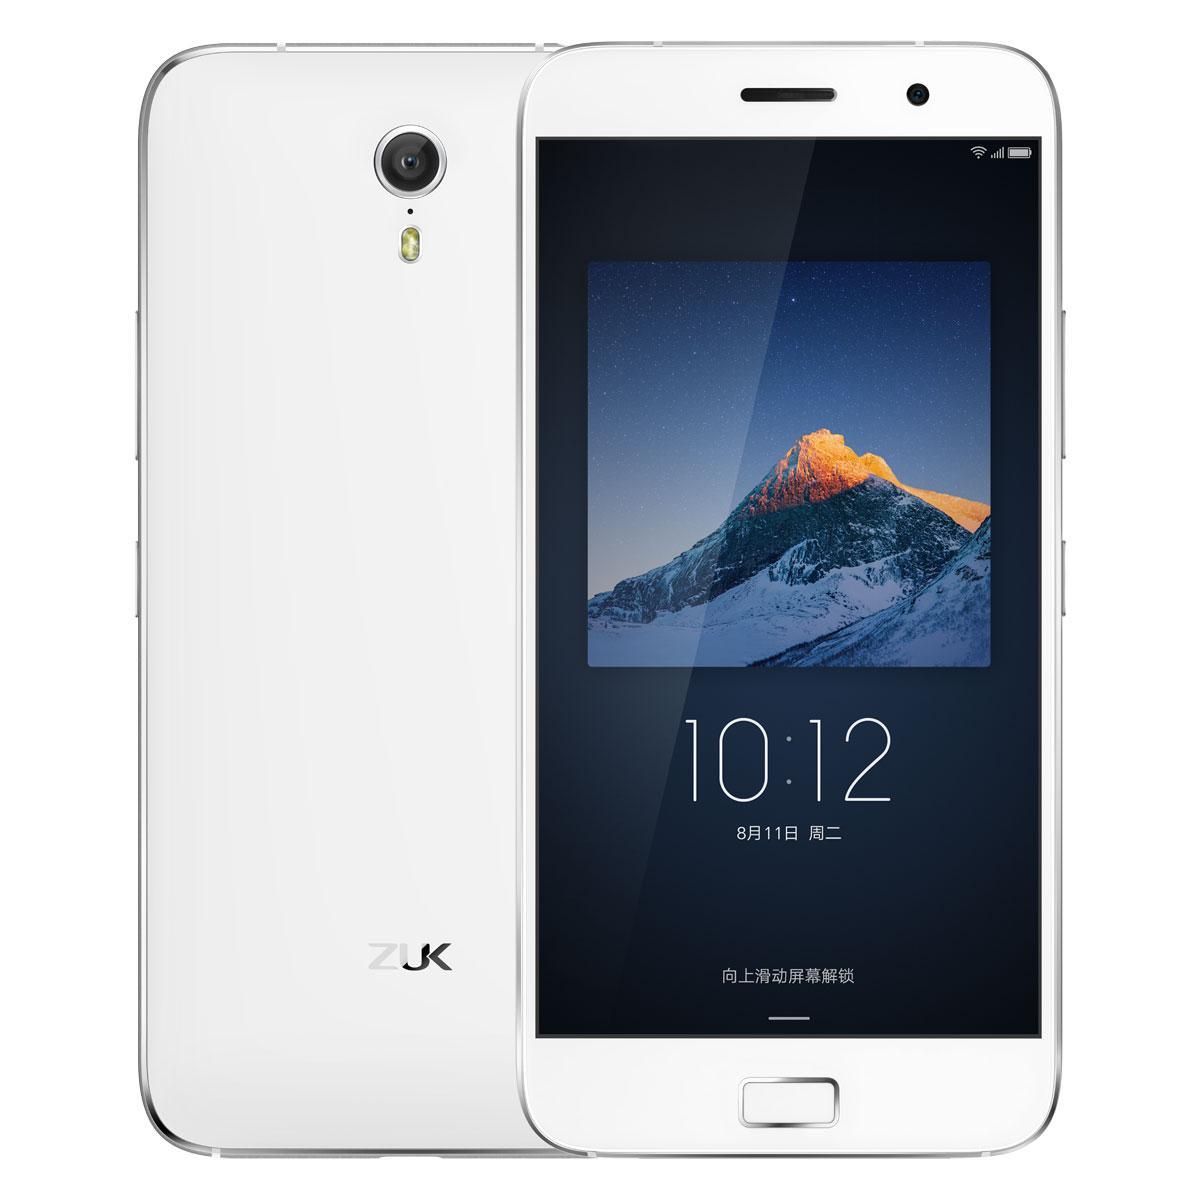 "Smartphone 5.5"" Lenovo ZUK Z1 Dual Sim  Blanc - IPS 1920x1080, Snapdragon 801 2.5GHz, RAM 3Go, 64Go, Cyanogen 12.1 + Écran en verre trempé 9C41"